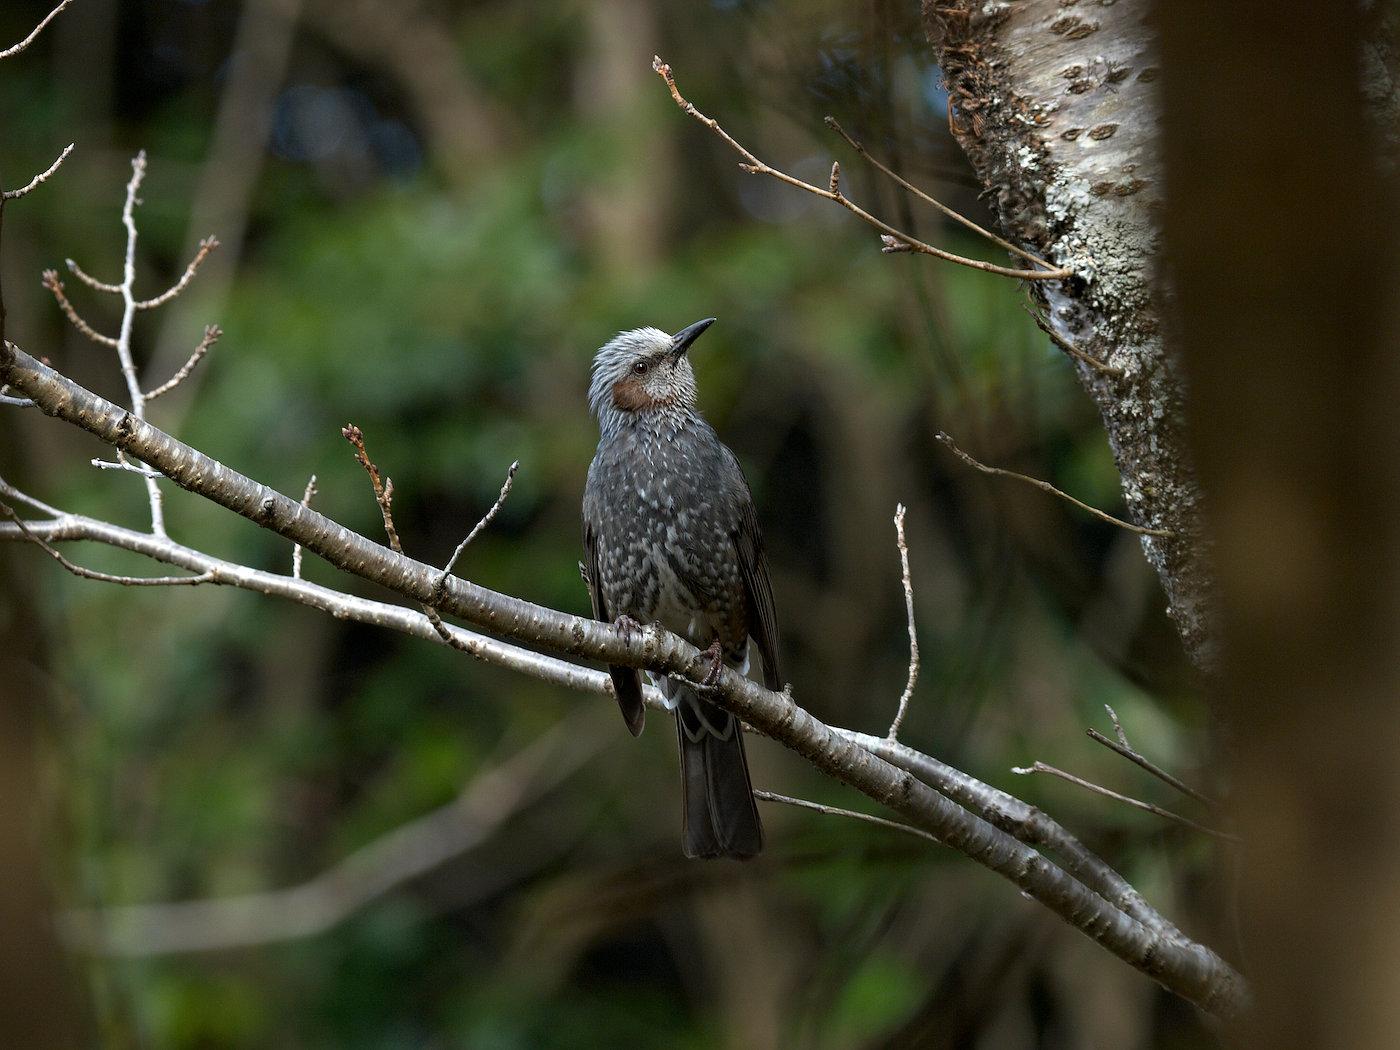 BORG50FLで撮影した野鳥・ヒヨドリの写真画像